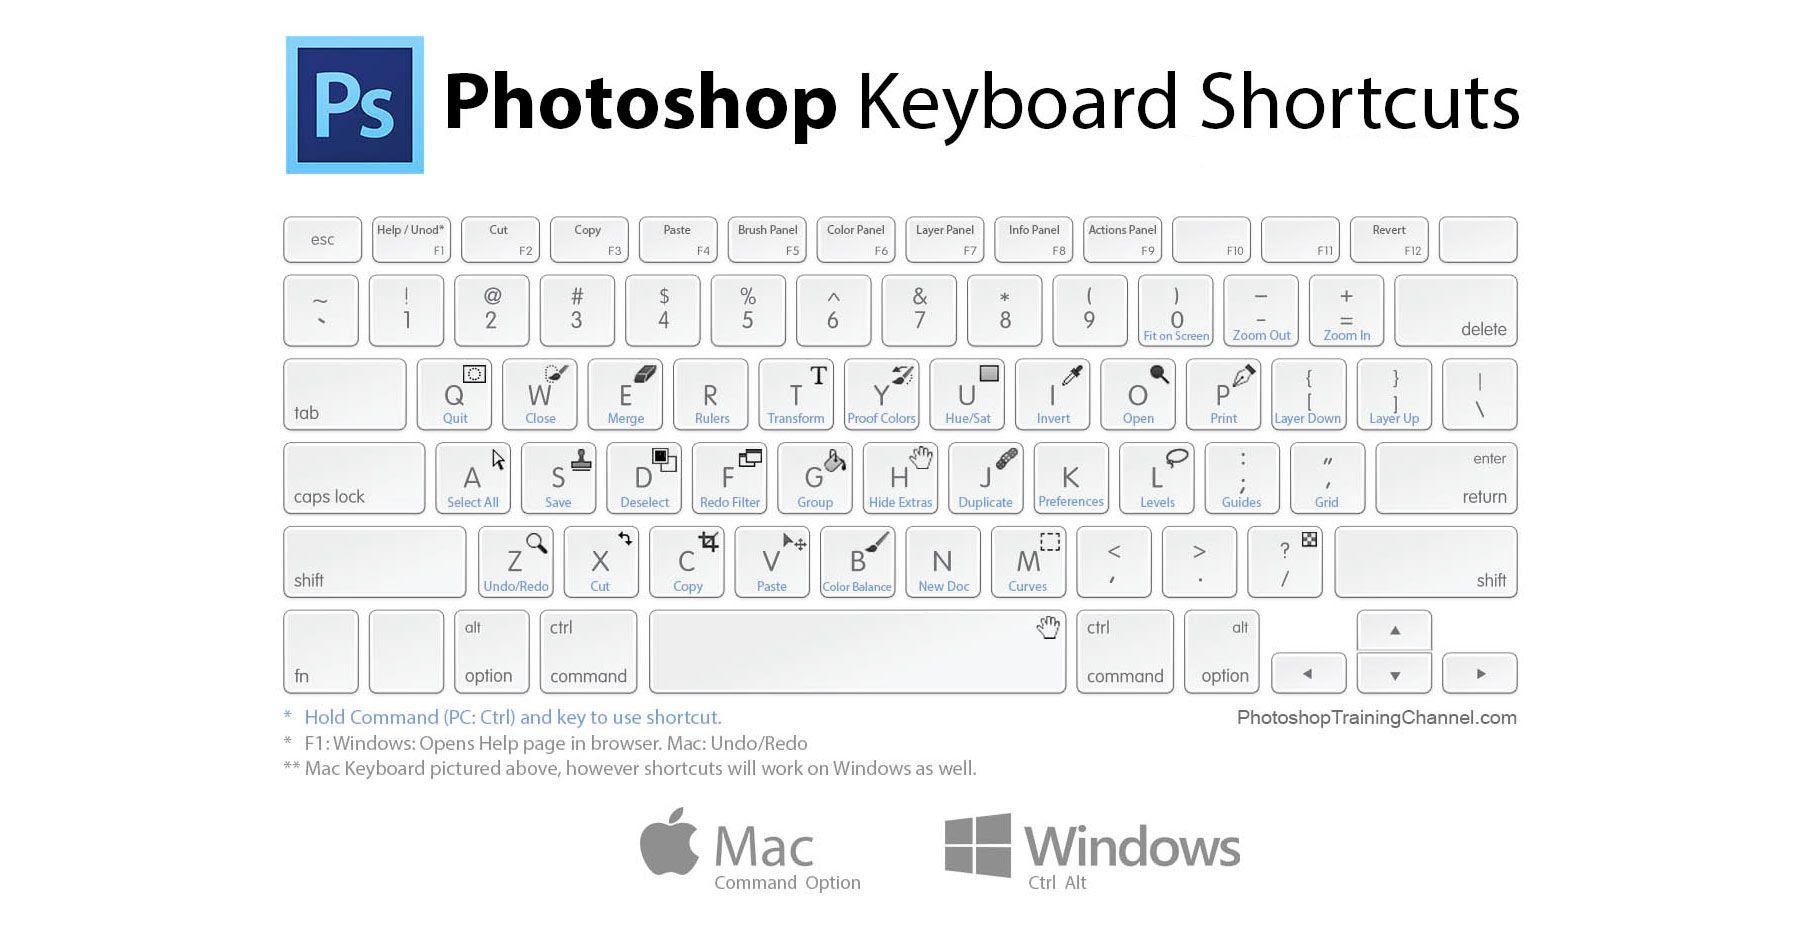 Atalhos do photoshop cs6 para mac e windows utilidade pinterest atalhos do photoshop cs6 para mac e windows ccuart Image collections